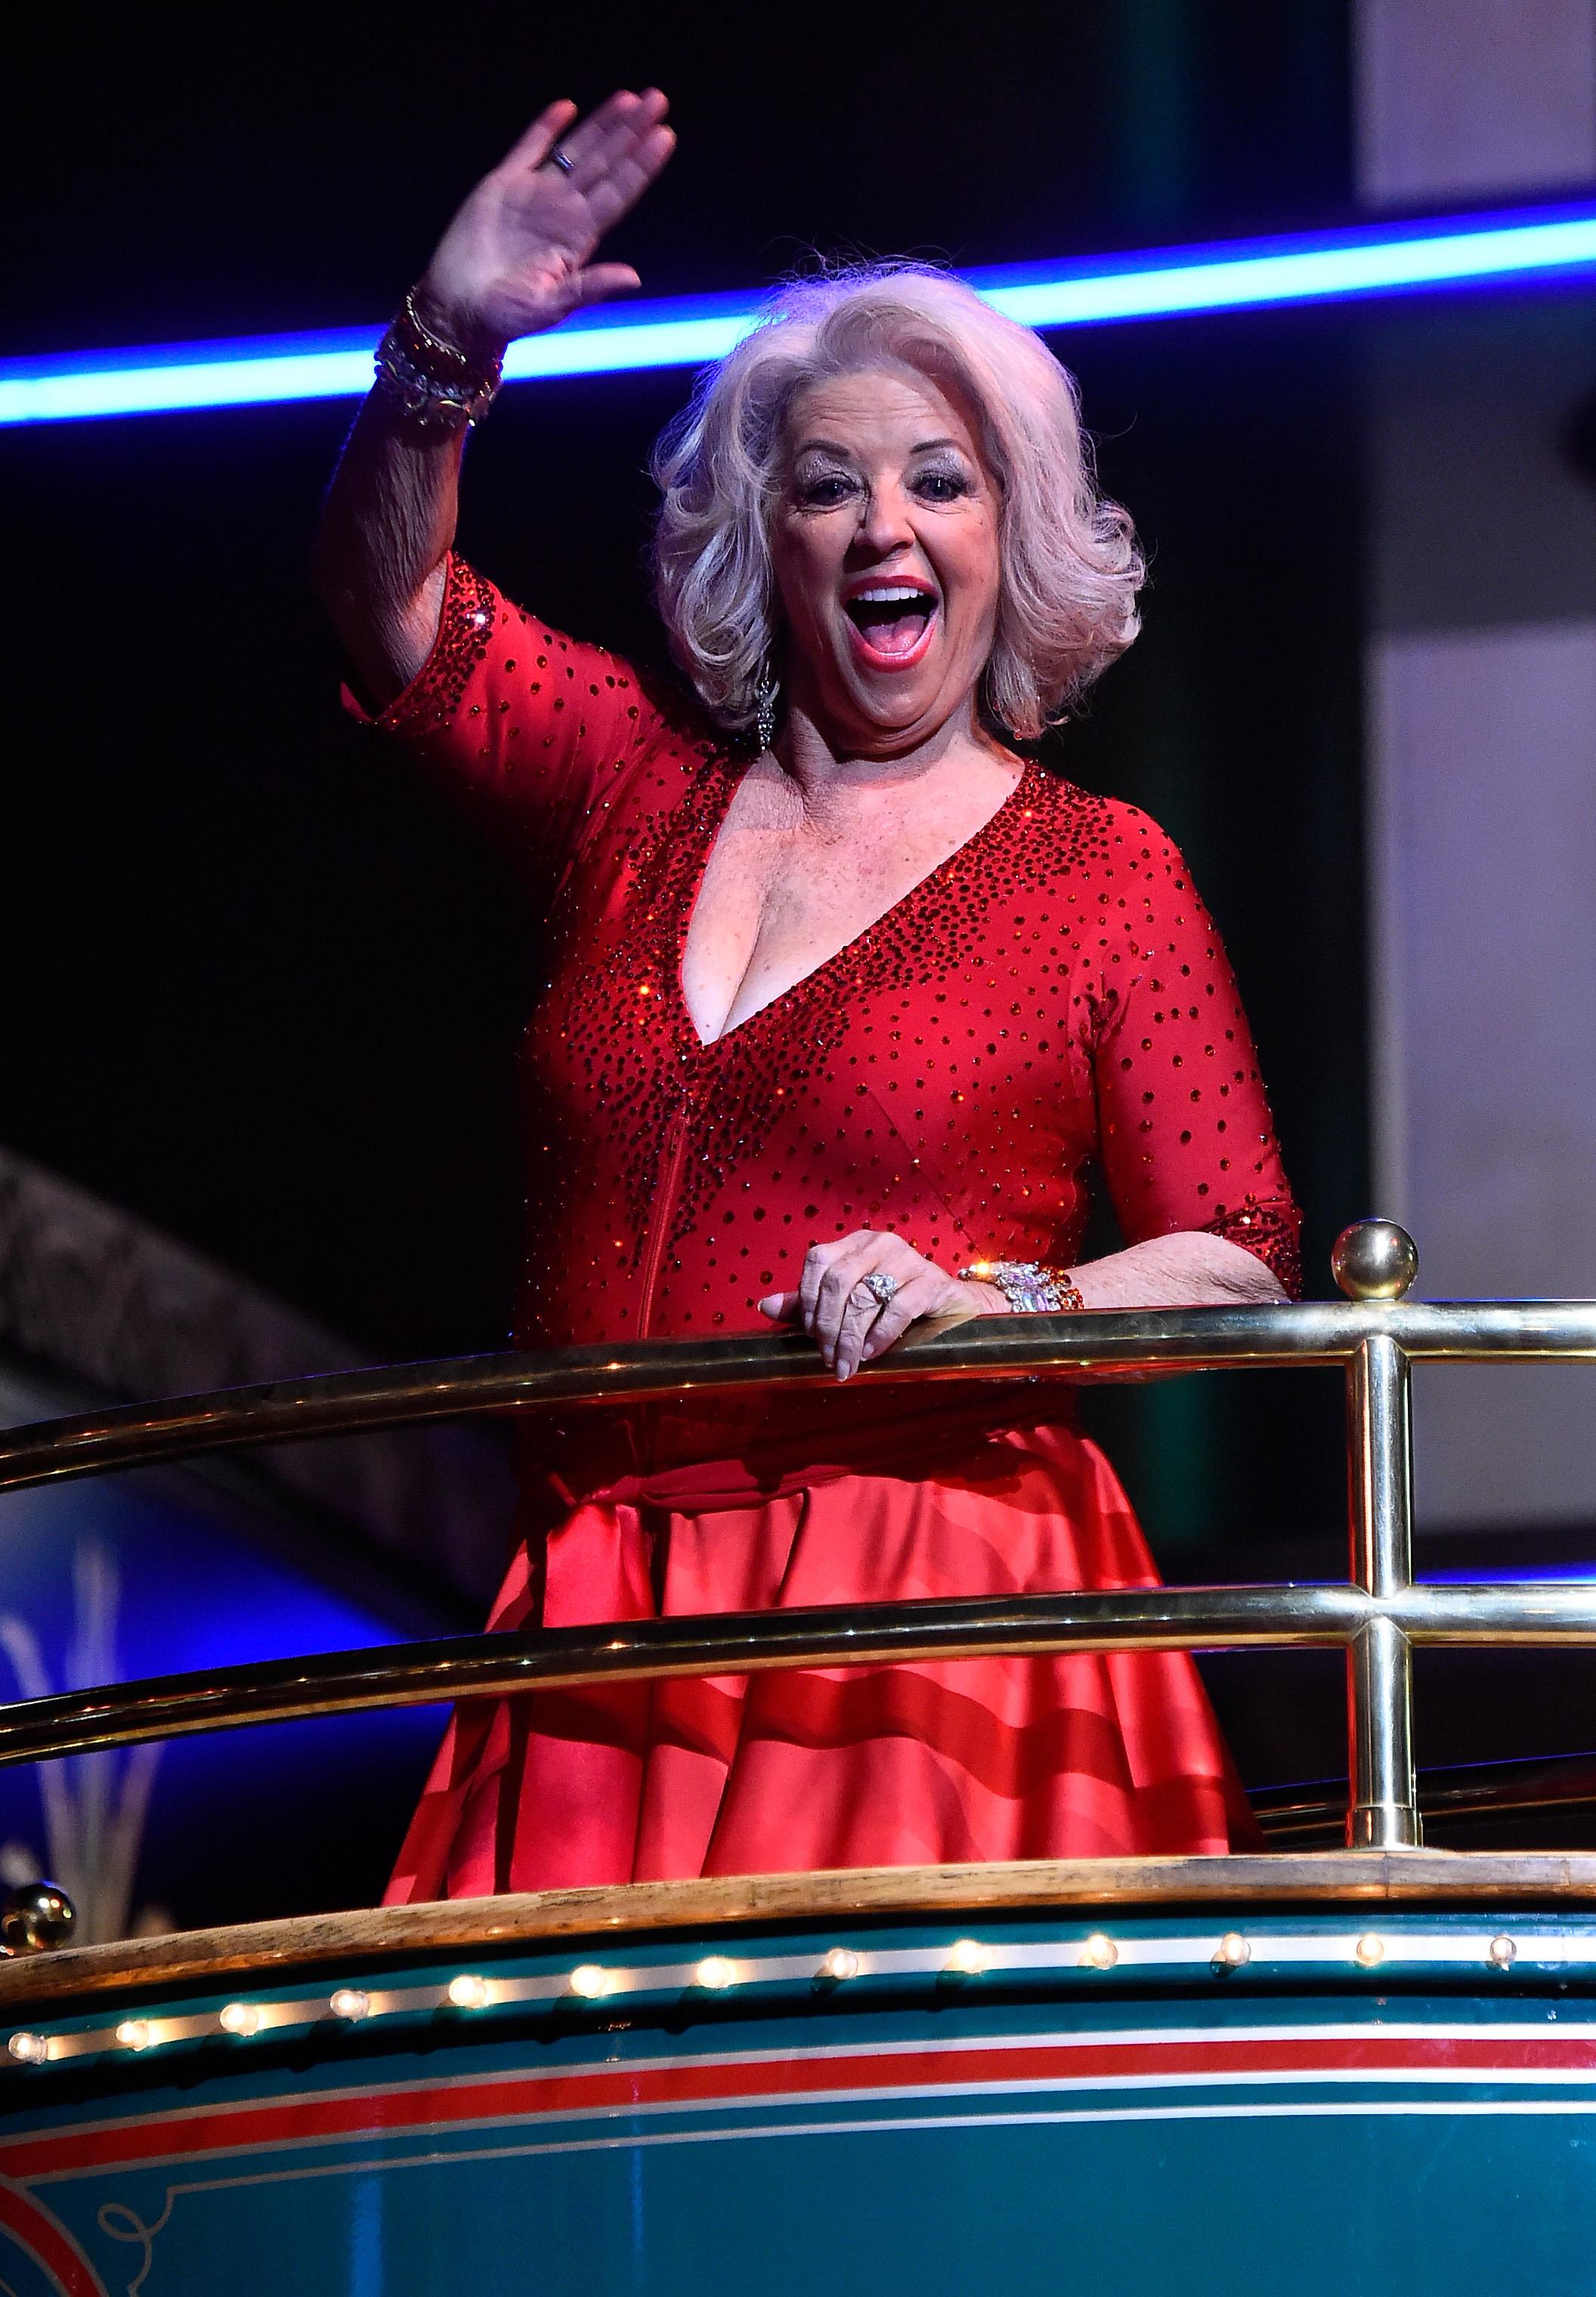 Paula deen photo getty images - Paula Deen Is Getting Into The Fashion Business